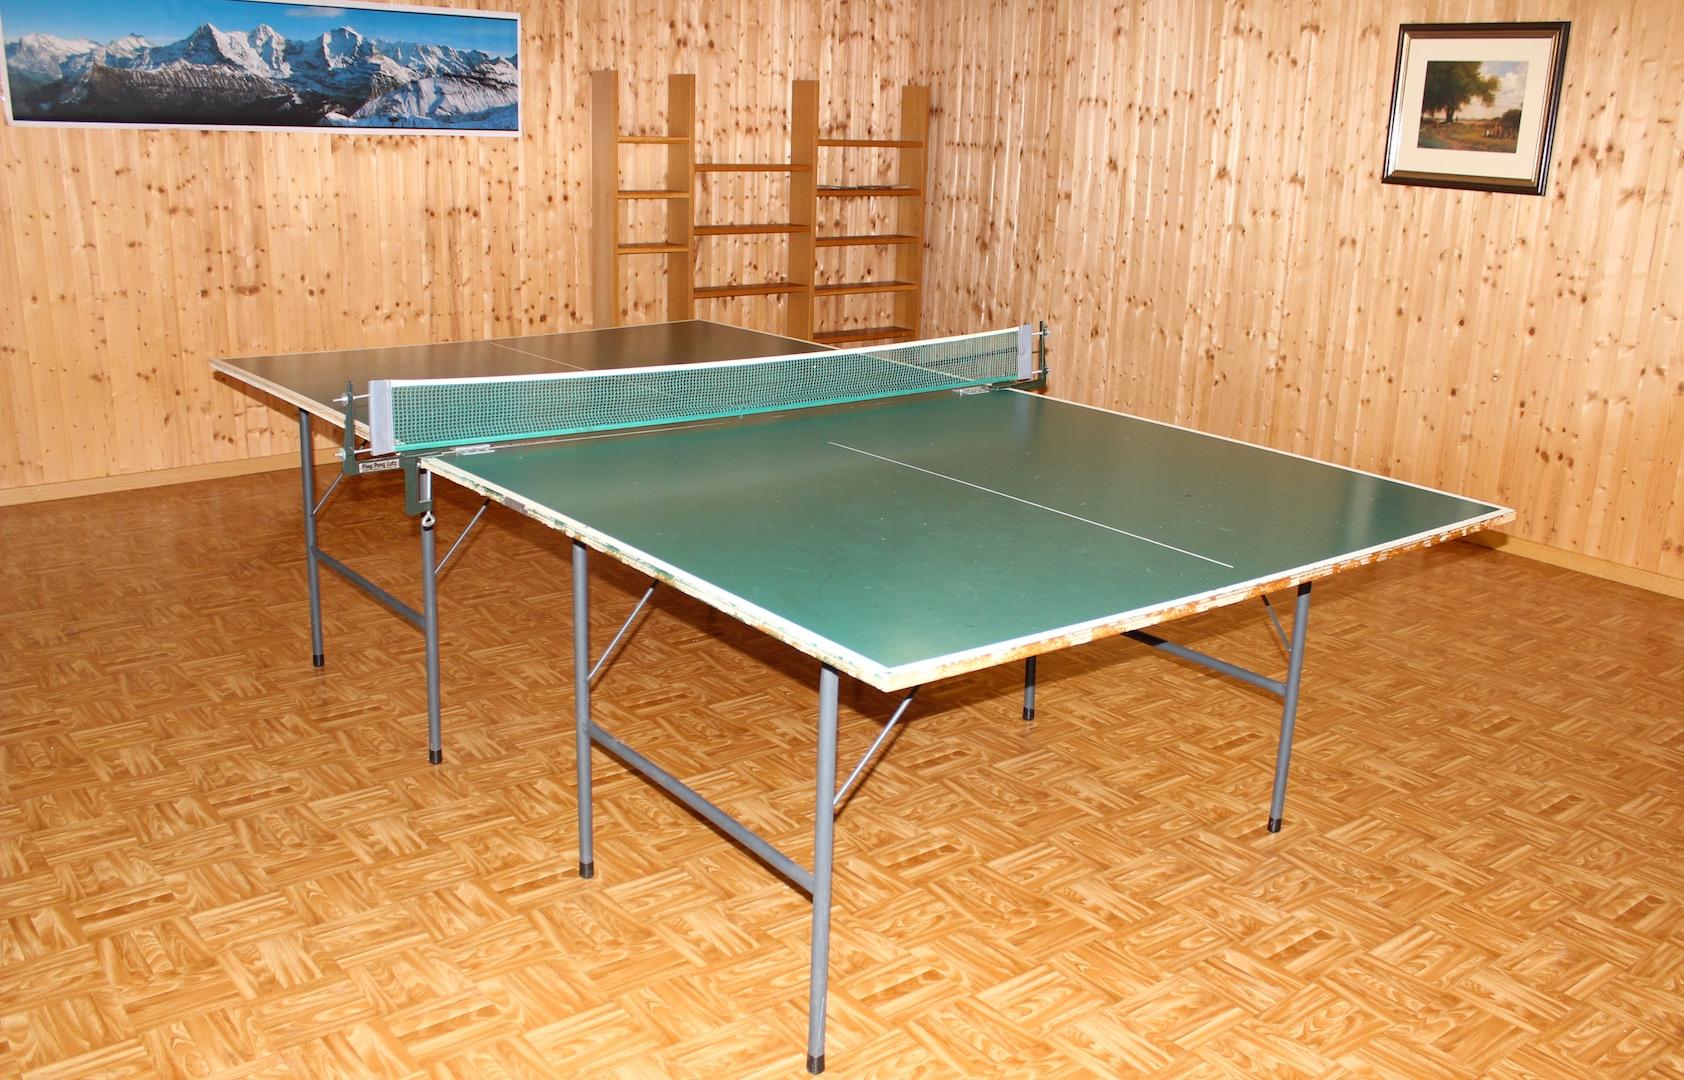 Ping Pong-Tisch im Hobbyraum